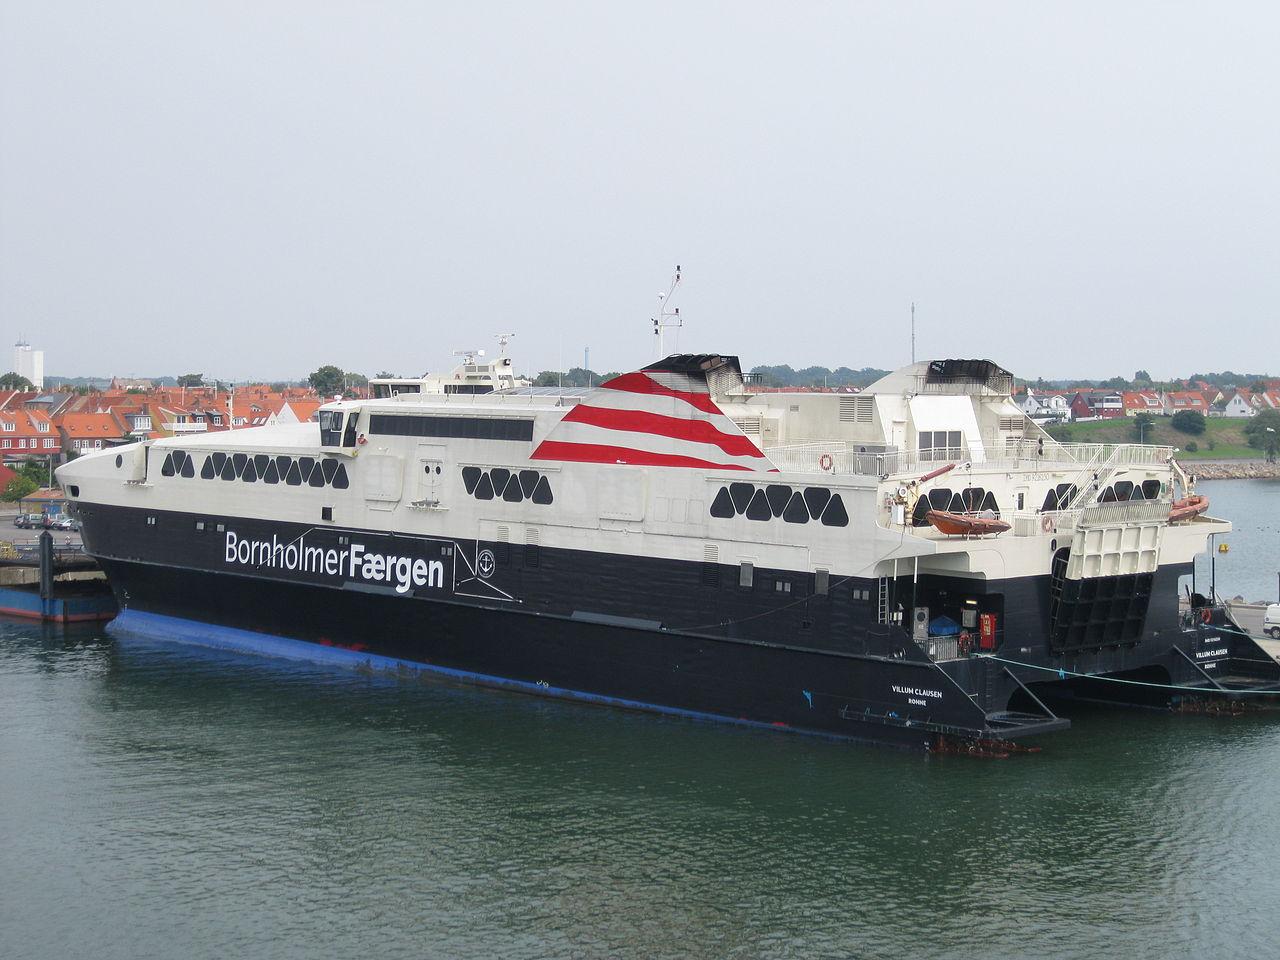 1280px-Ship_Villum_Clausen_2011